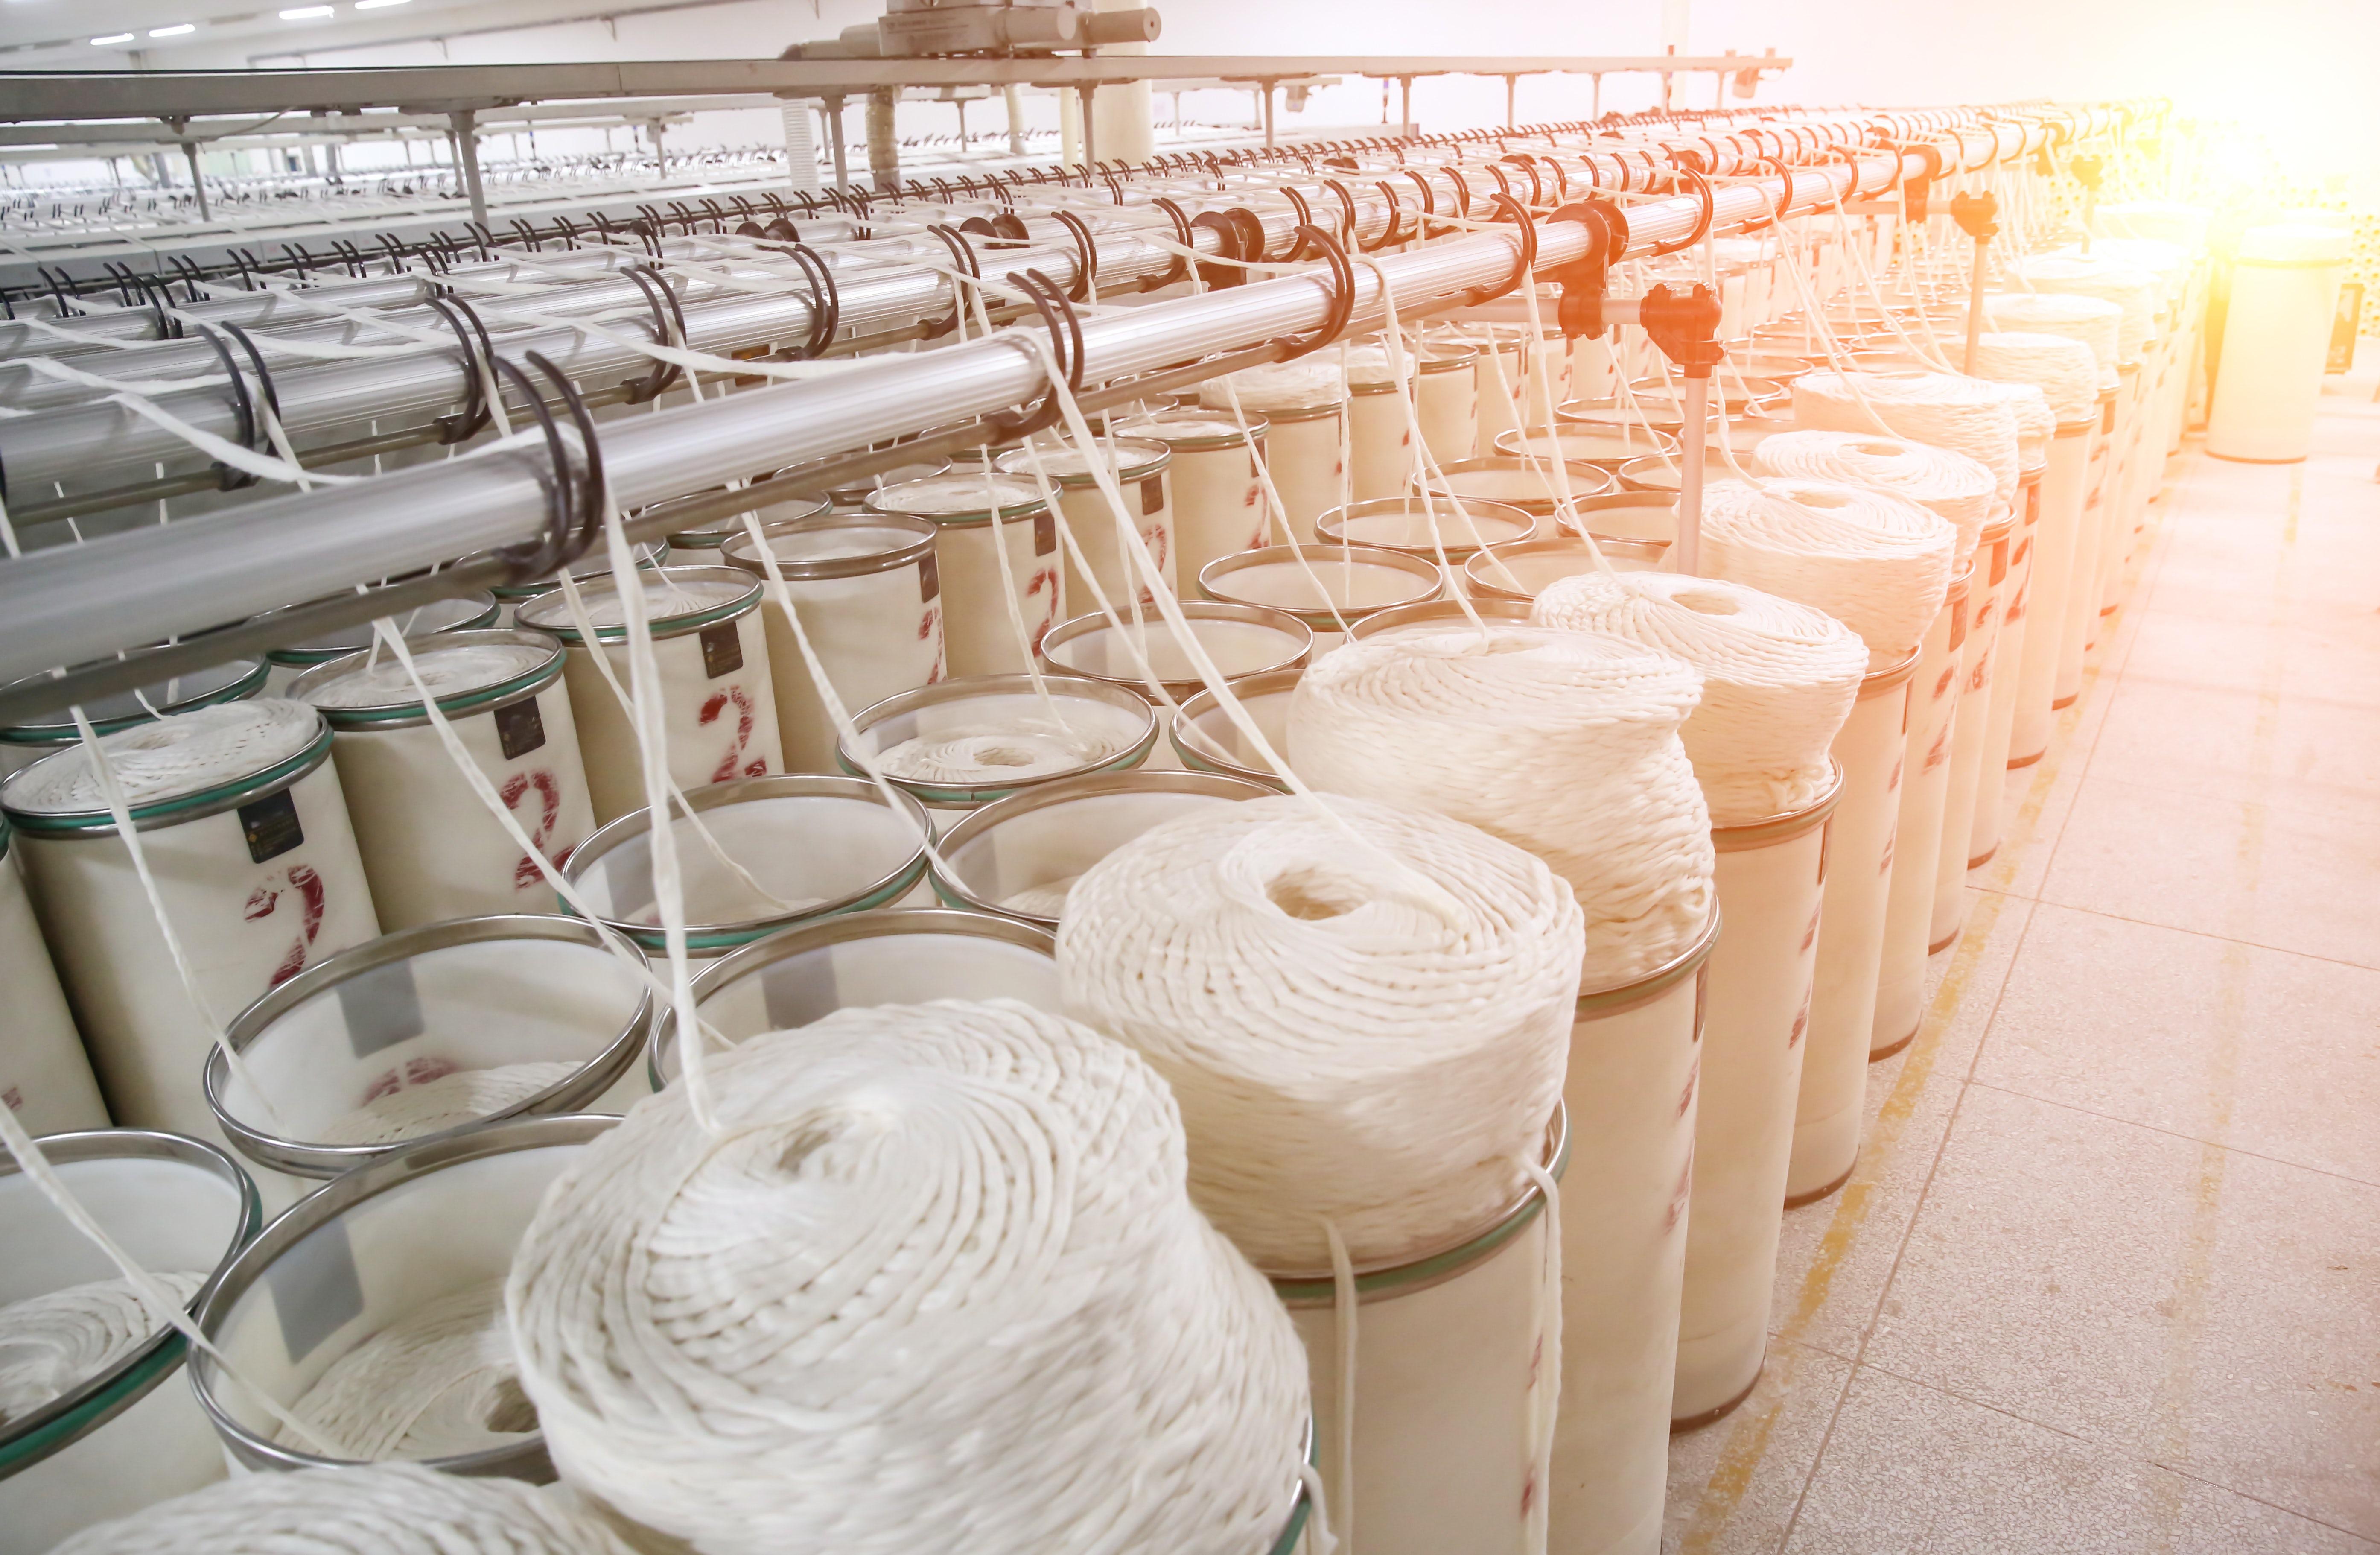 A textile factory | Source: Shutterstock